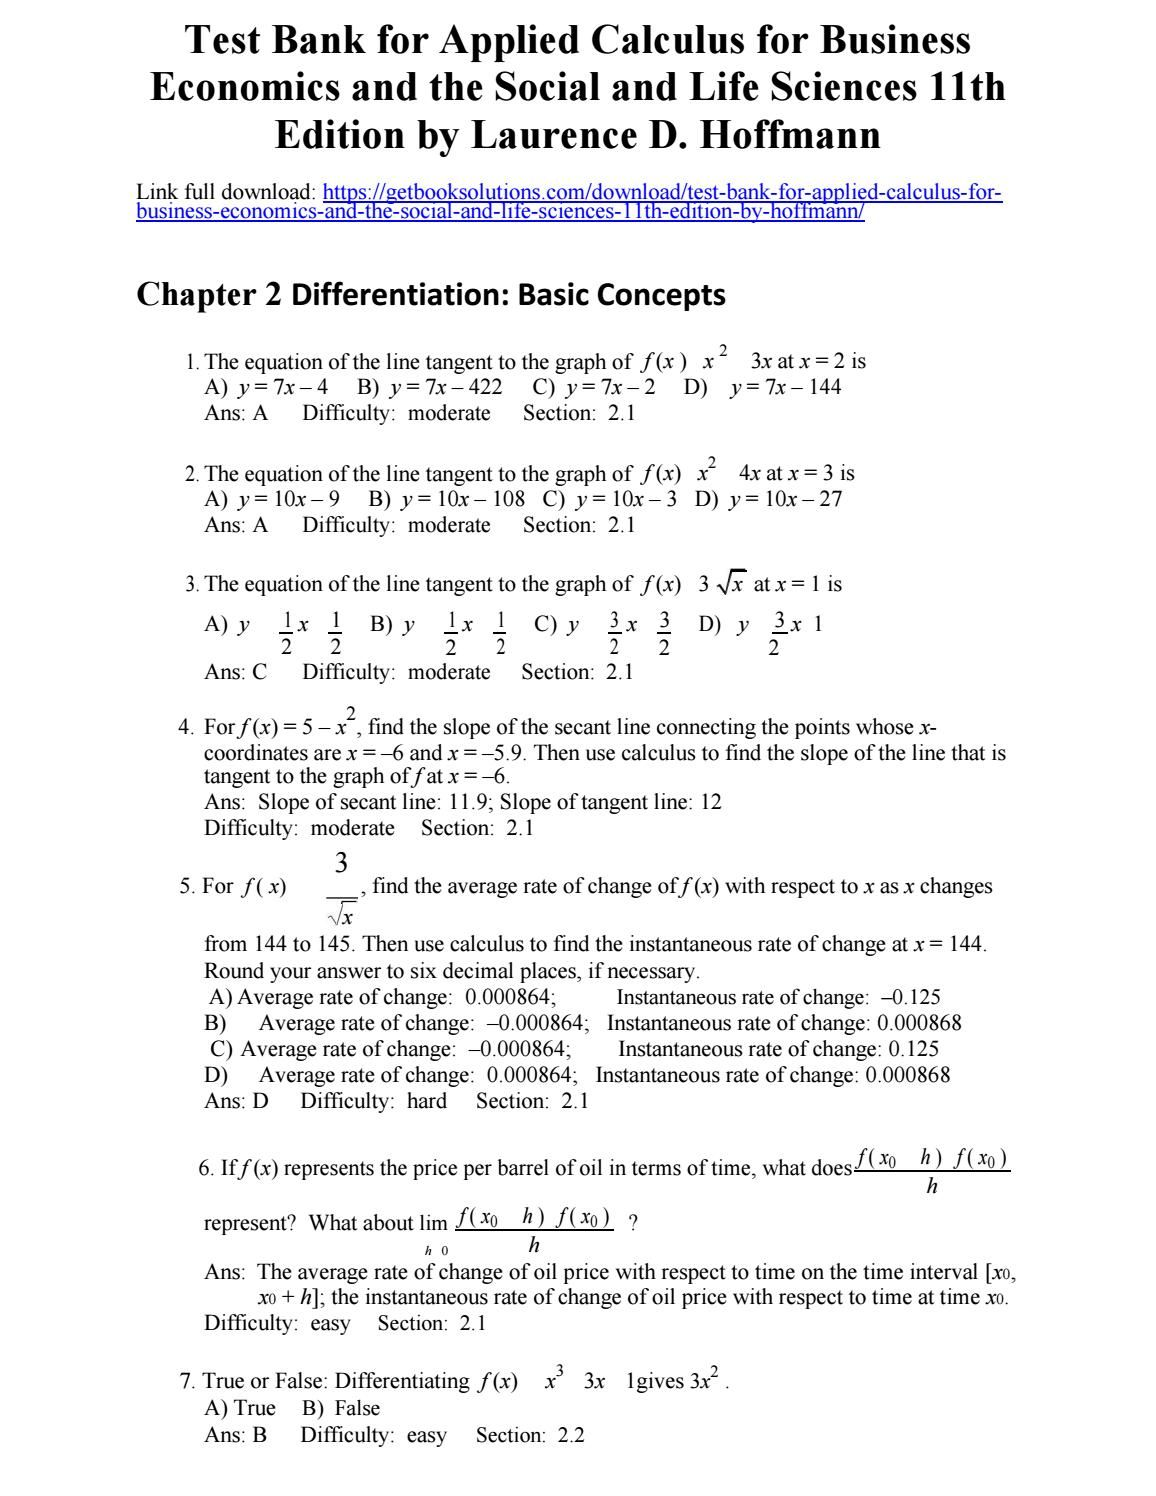 Test bank applied calculus business economics the social life test bank applied calculus business economics the social life sciences 11th edition hoffmann fandeluxe Images